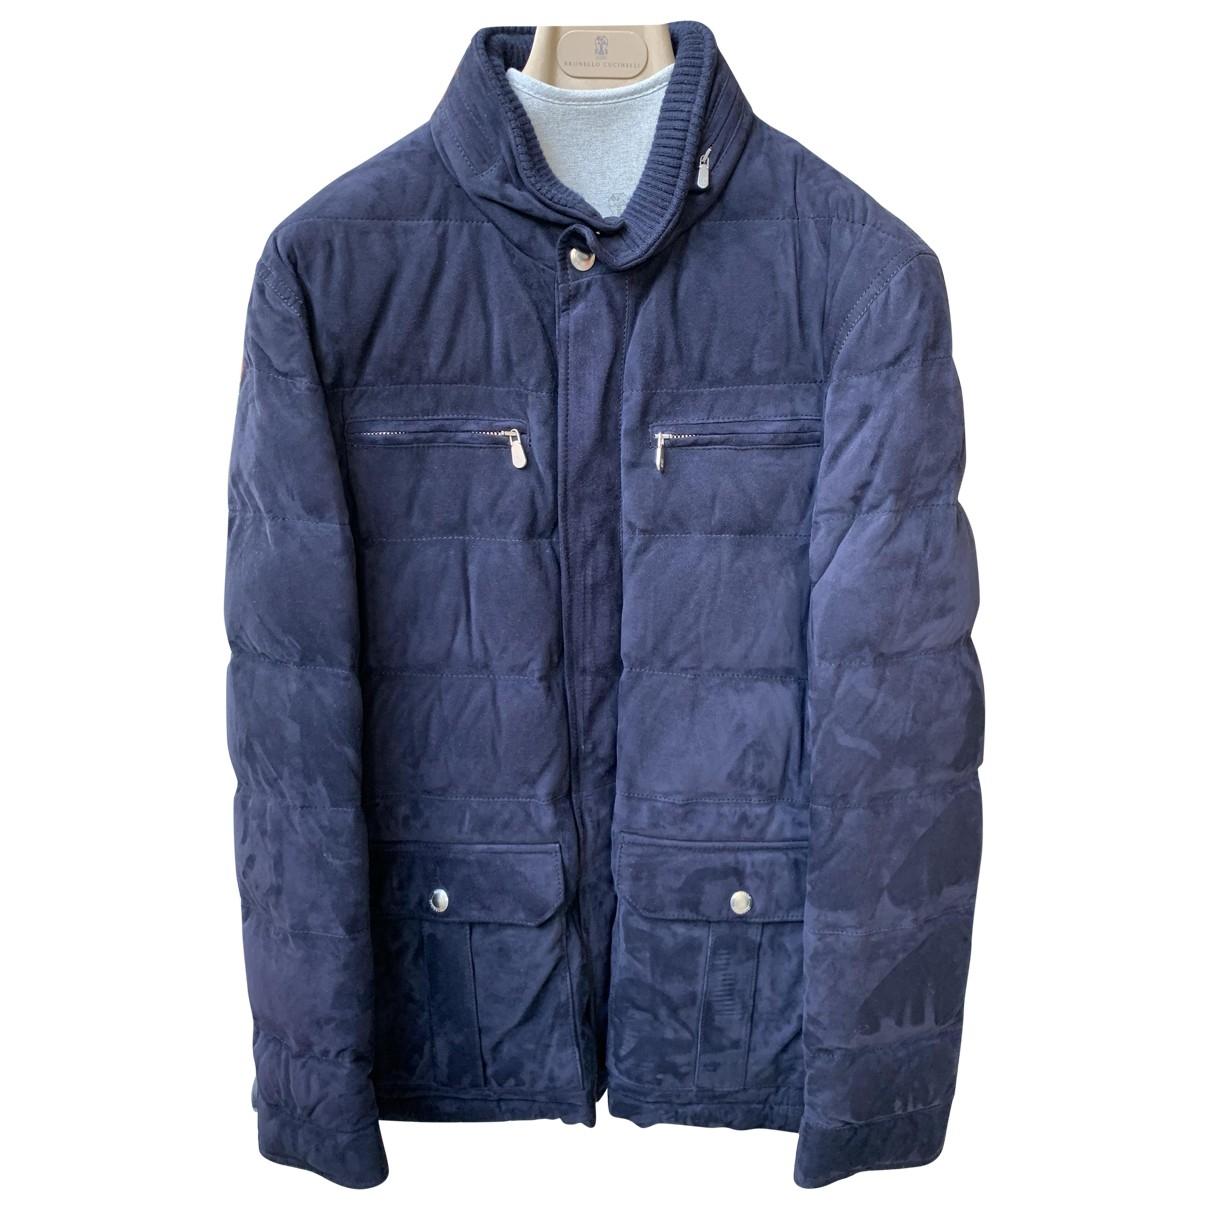 Brunello Cucinelli \N Navy Leather jacket  for Men M International